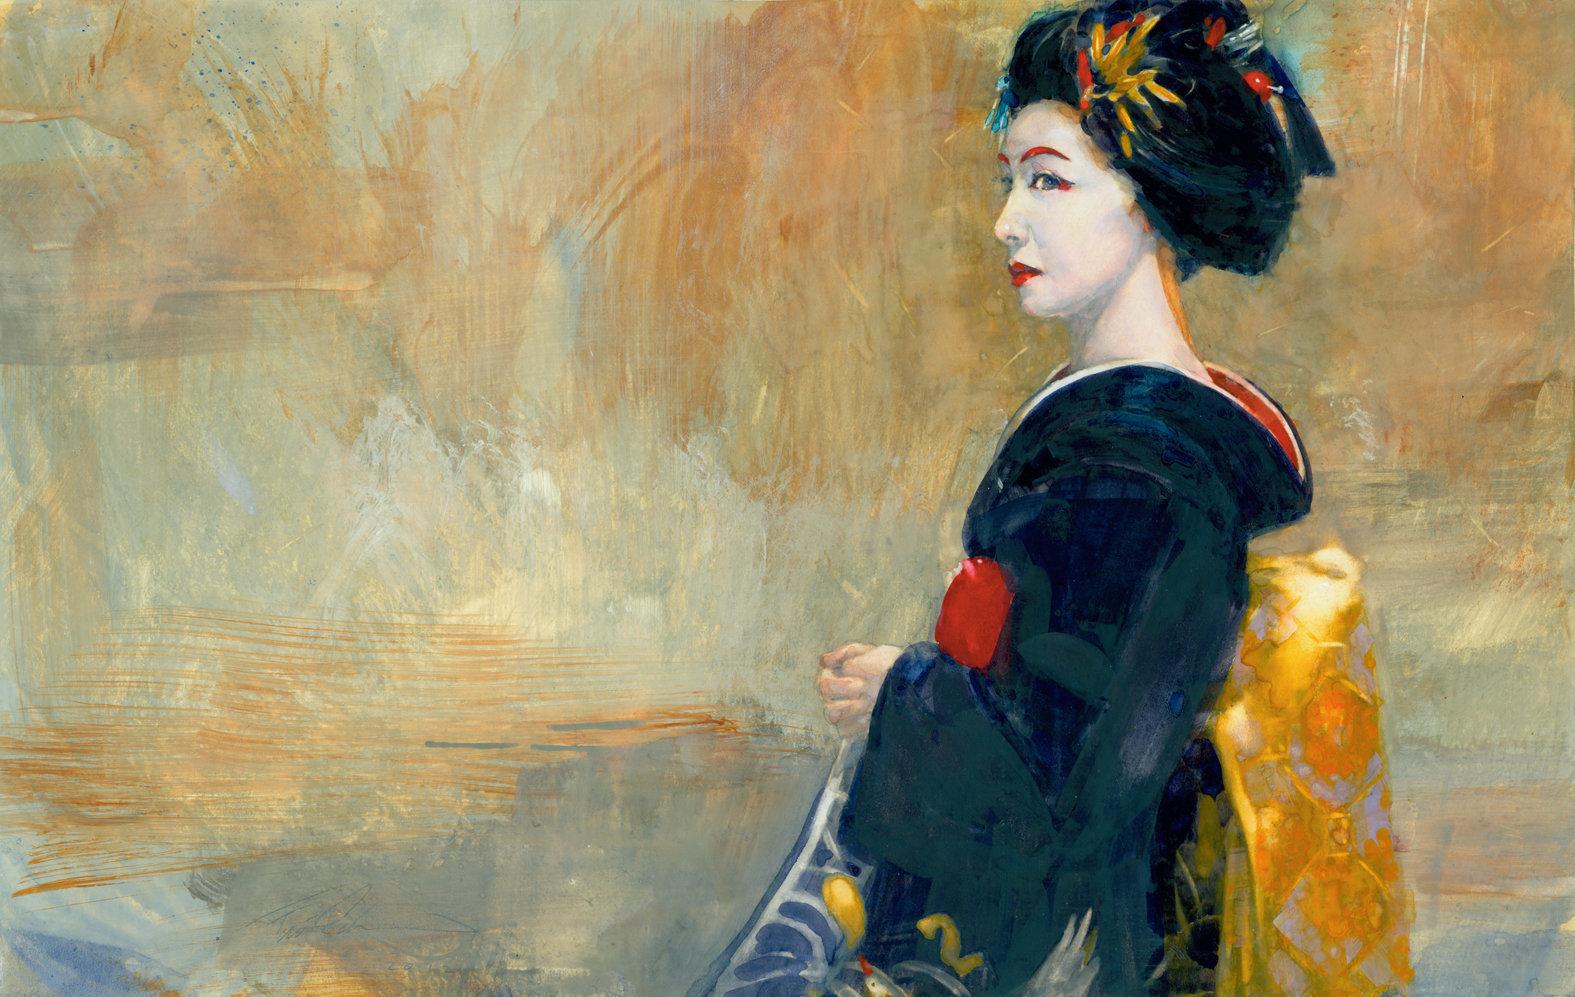 0020_geisha1-20-2012 final.jpg